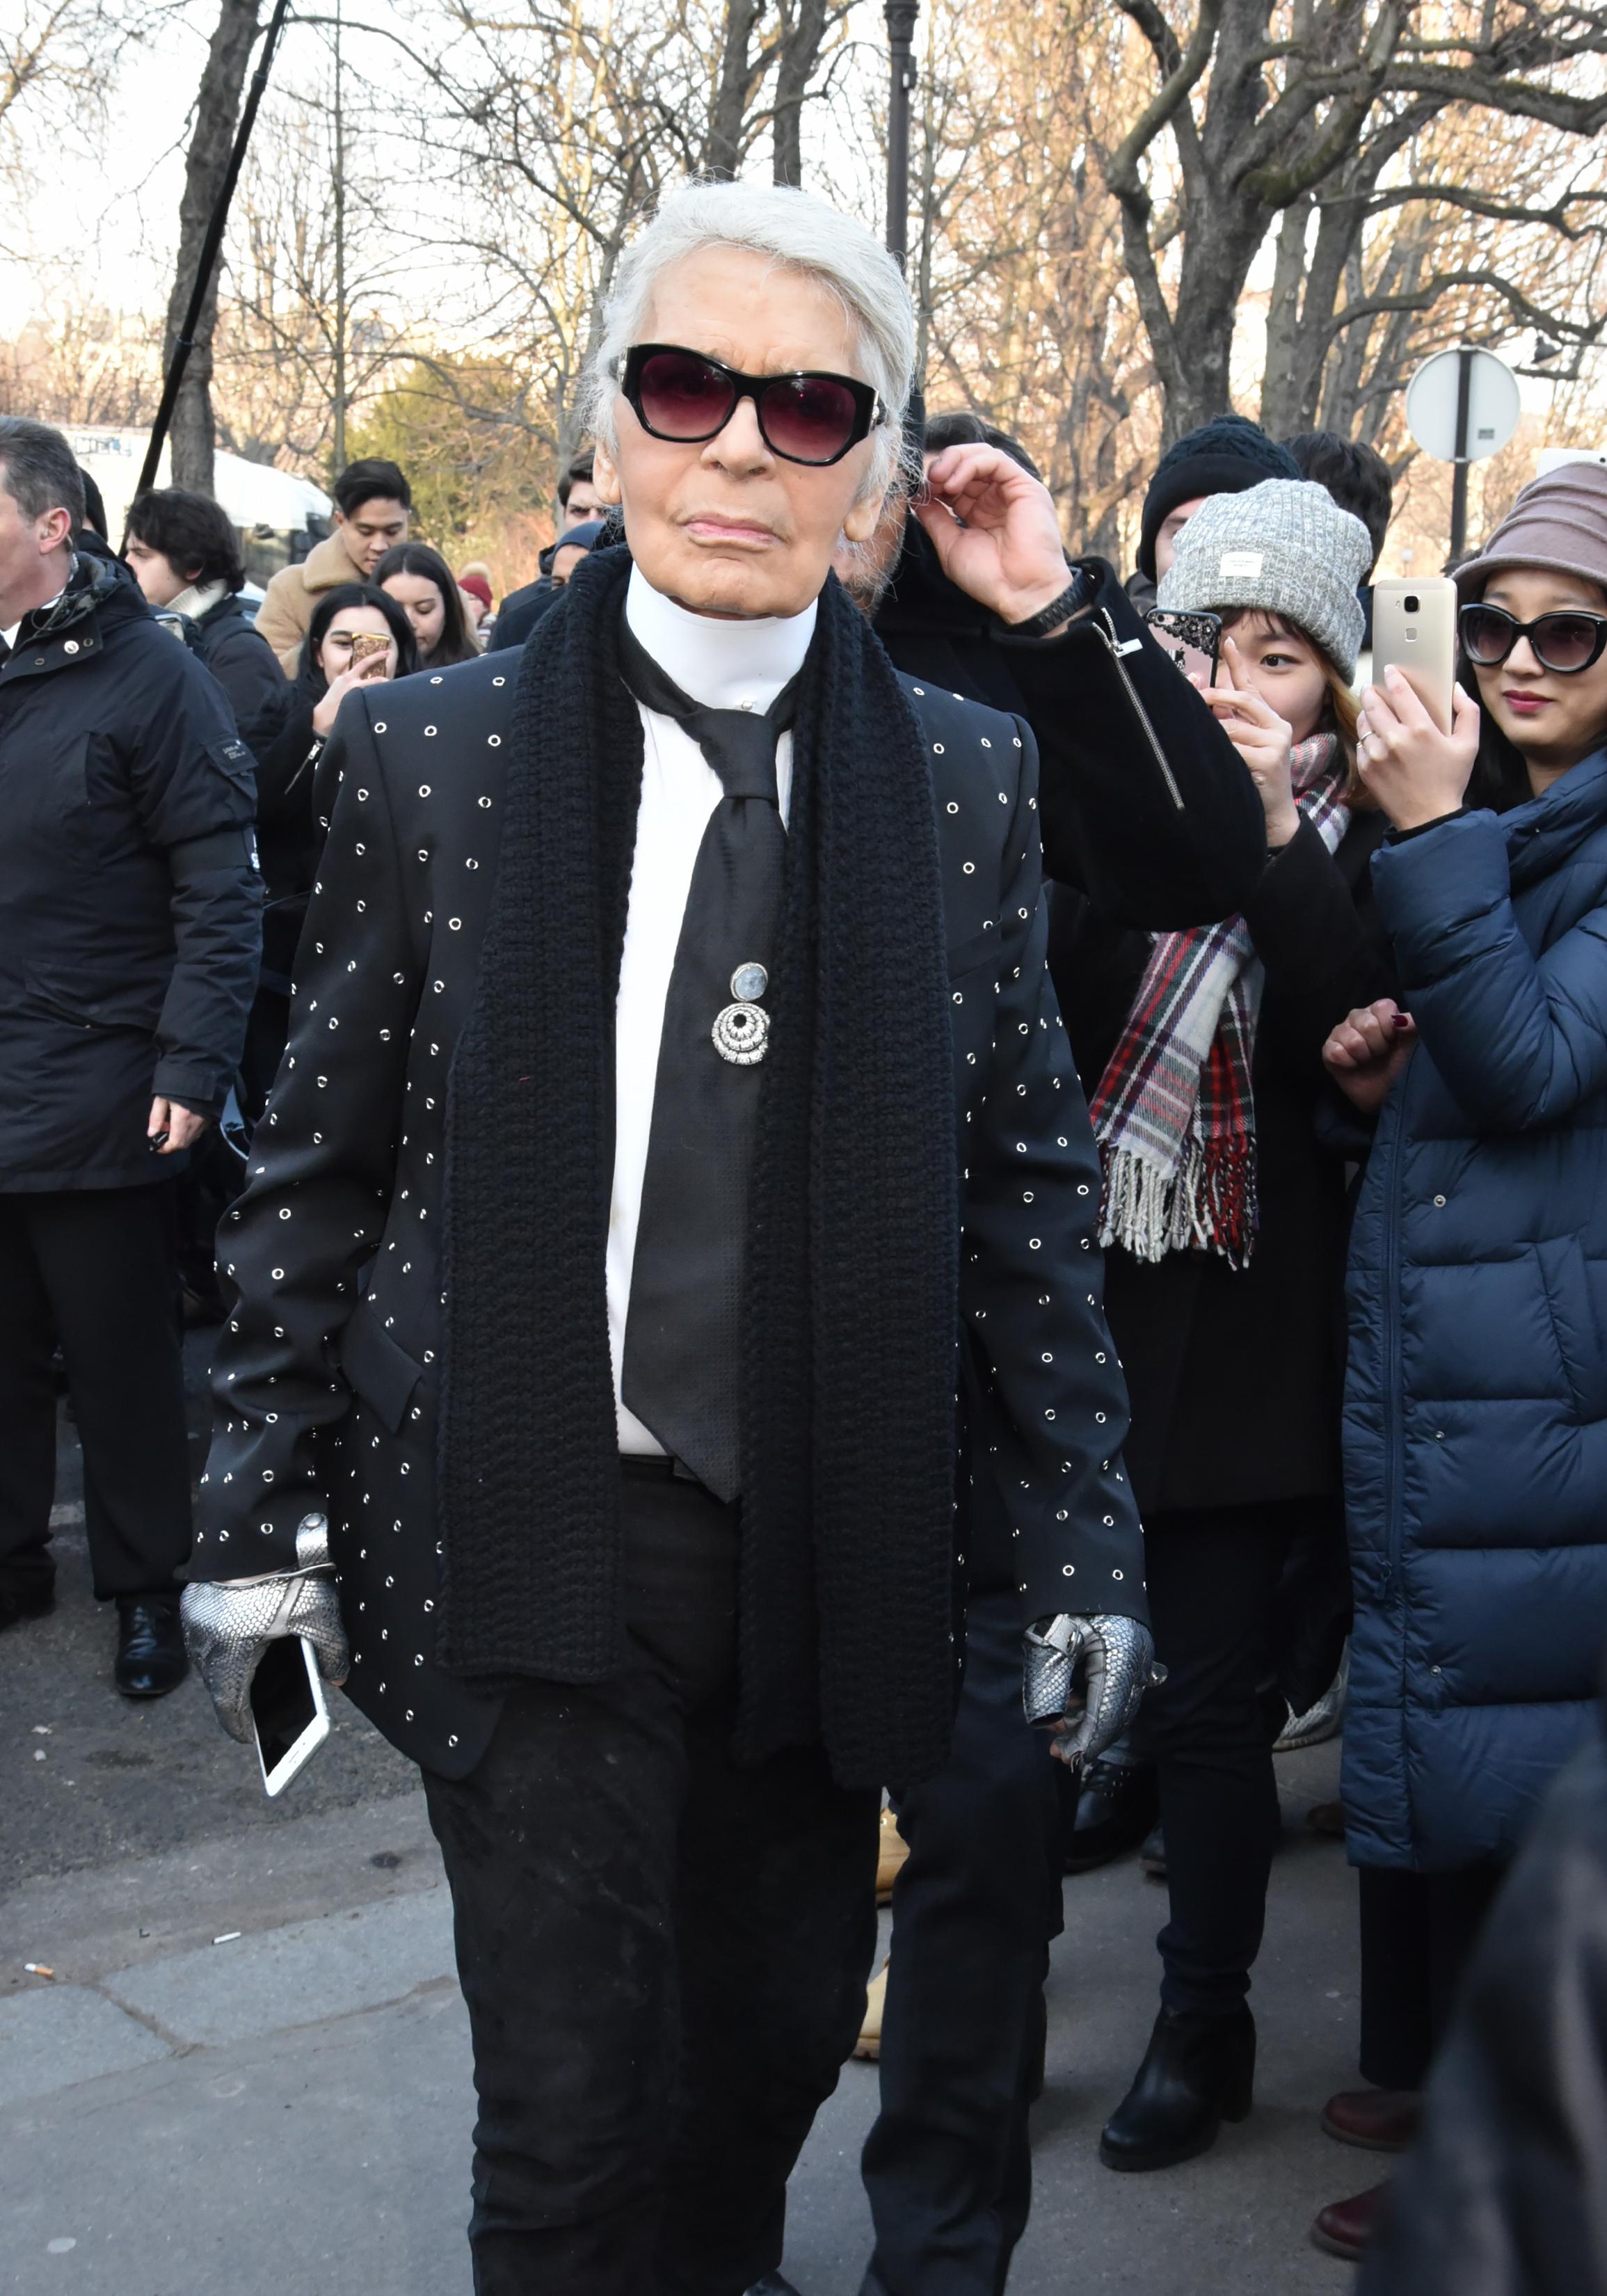 acd6d9b629 Karl Lagerfeld Calls Out Meryl Streep